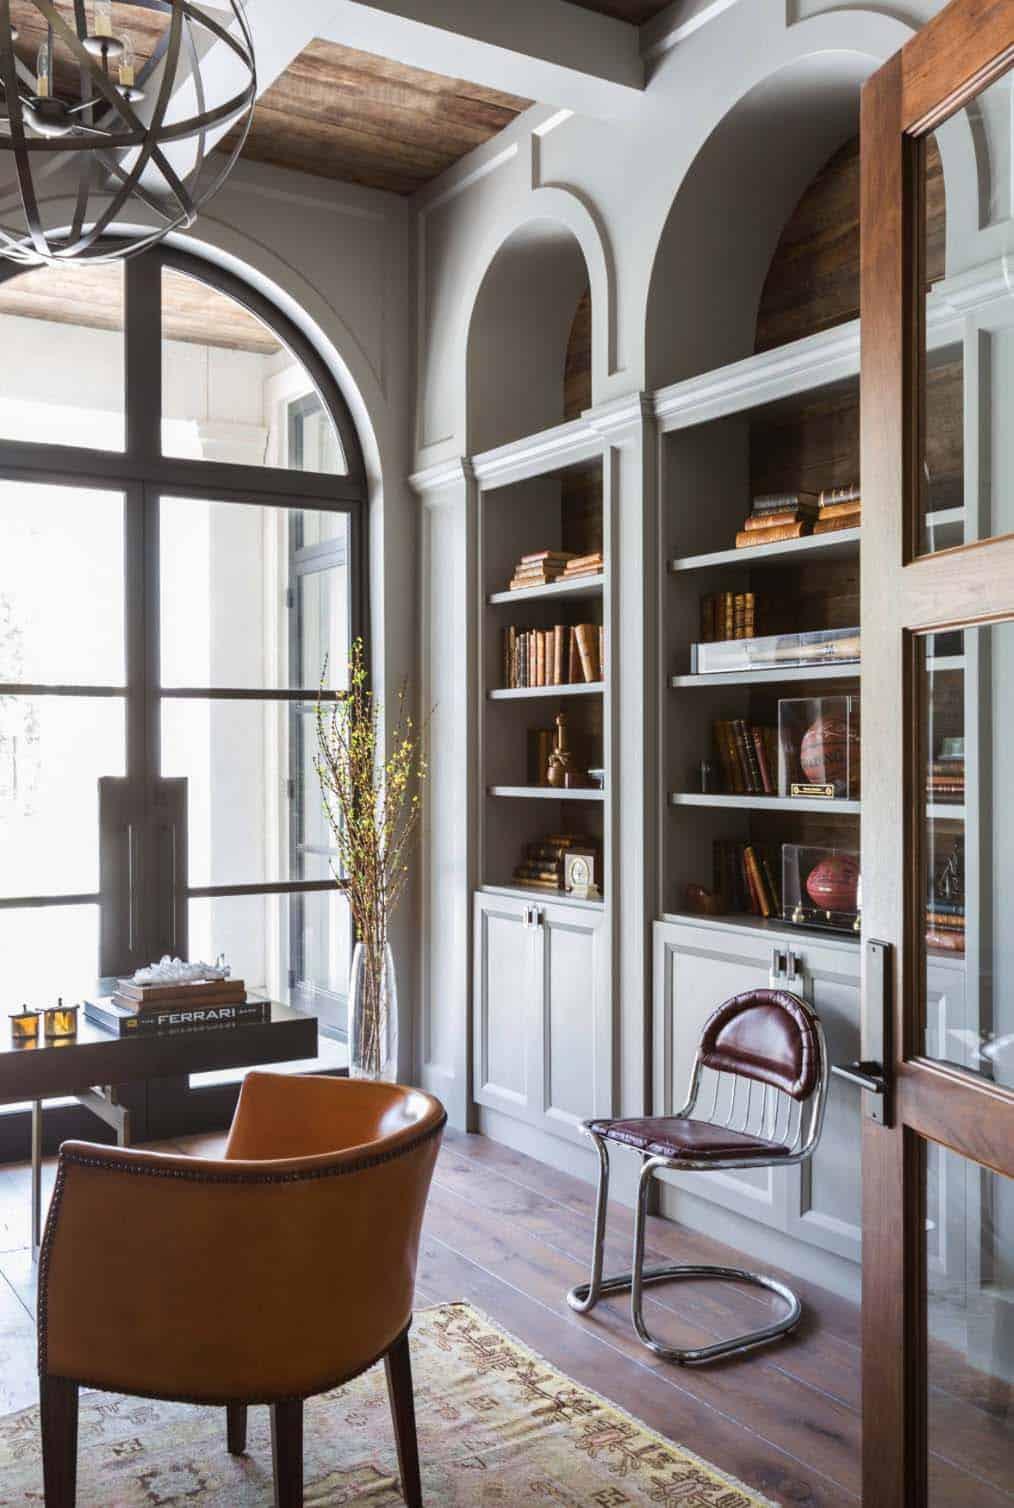 Maison de style méditerranéen-Marie Flanigan Interiors-12-1 Kindesign